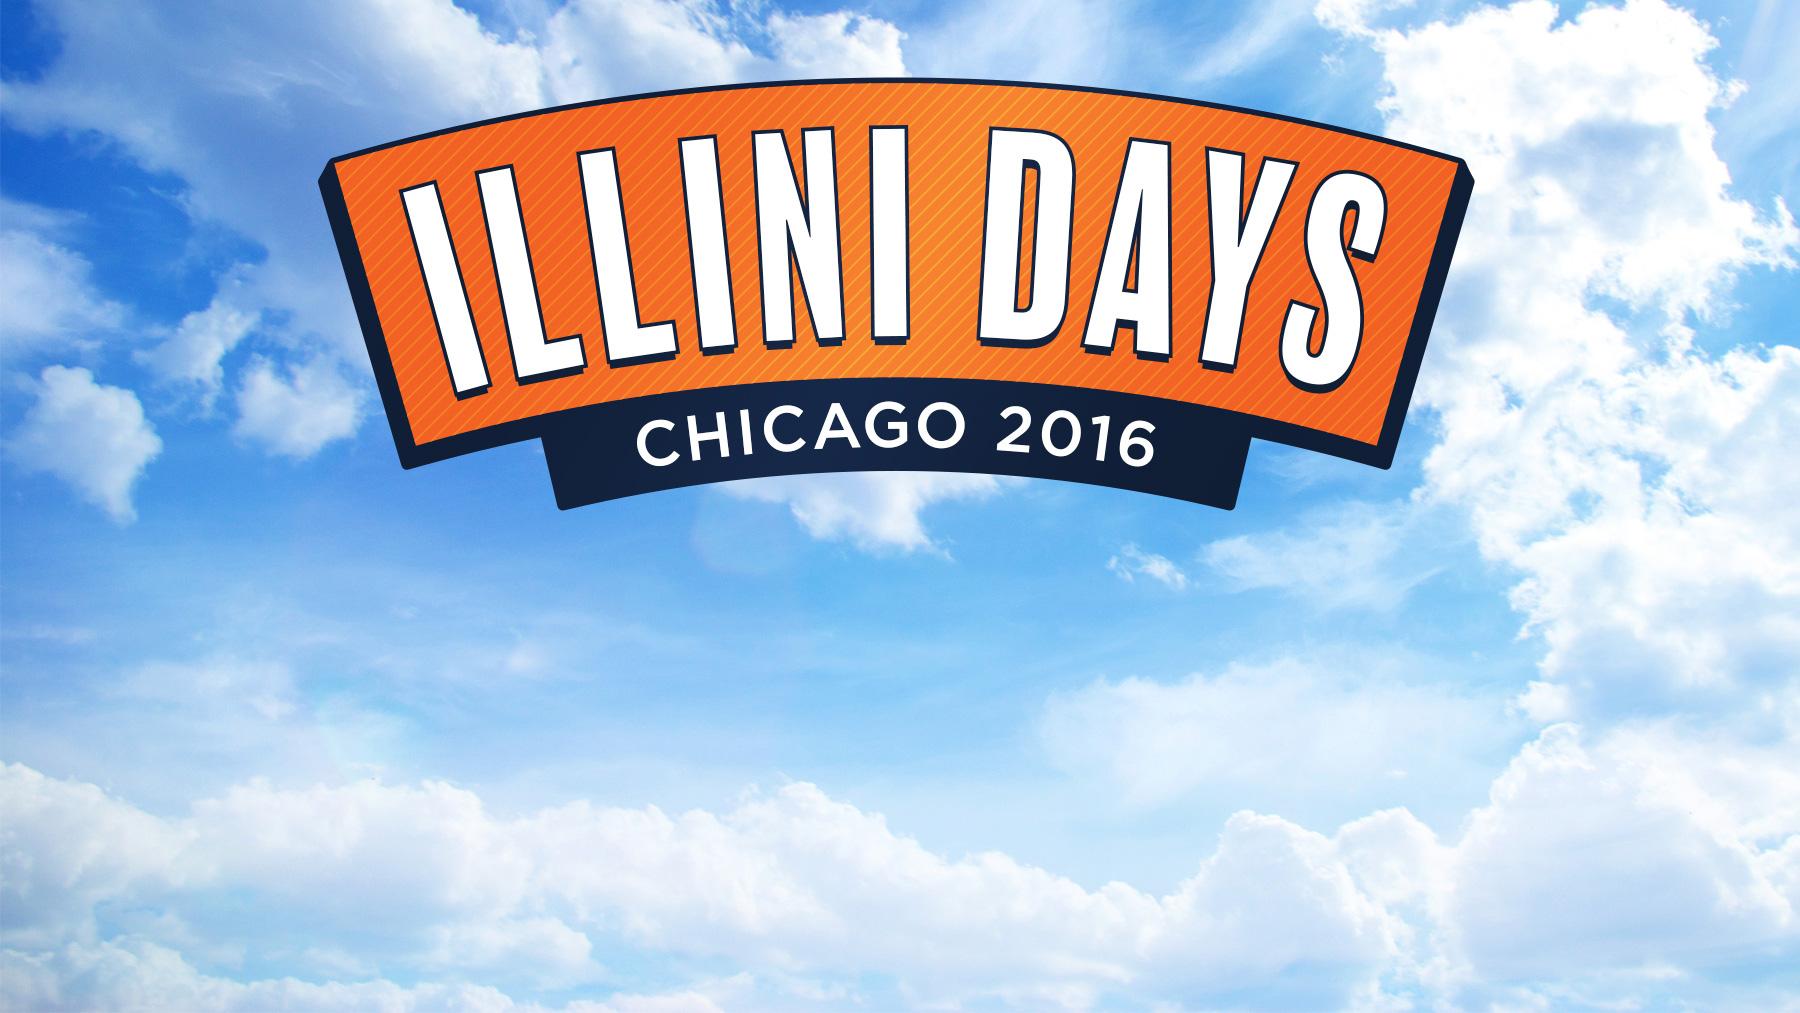 Illlini Days logo on blue sky background